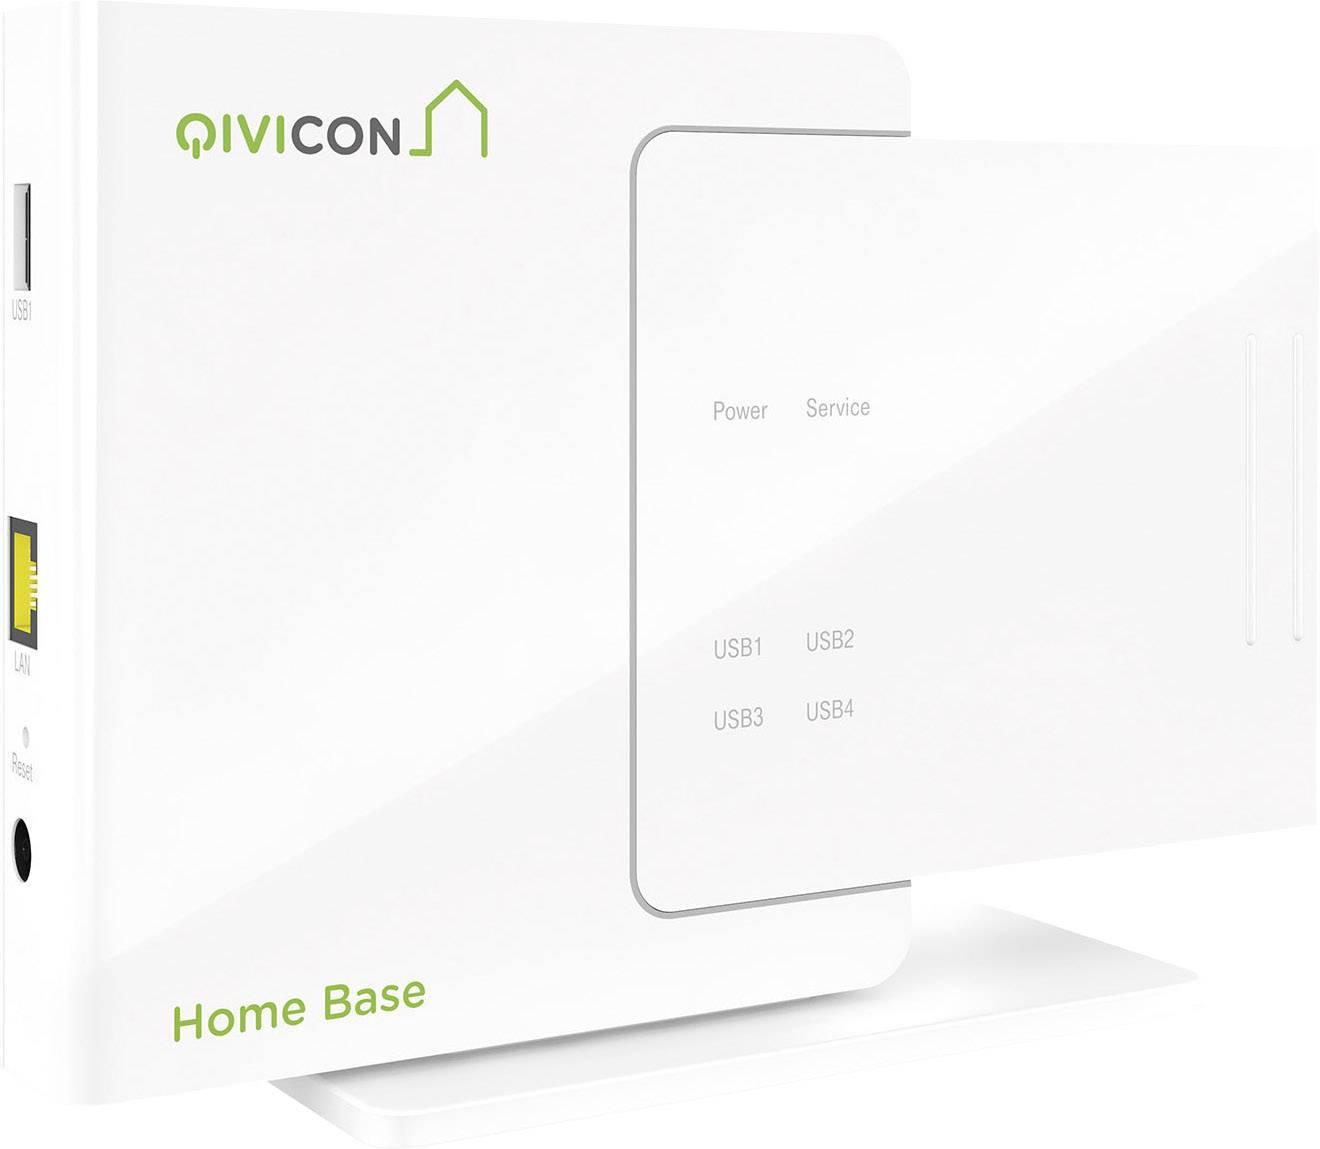 telekom smart home-basis | conrad.nl